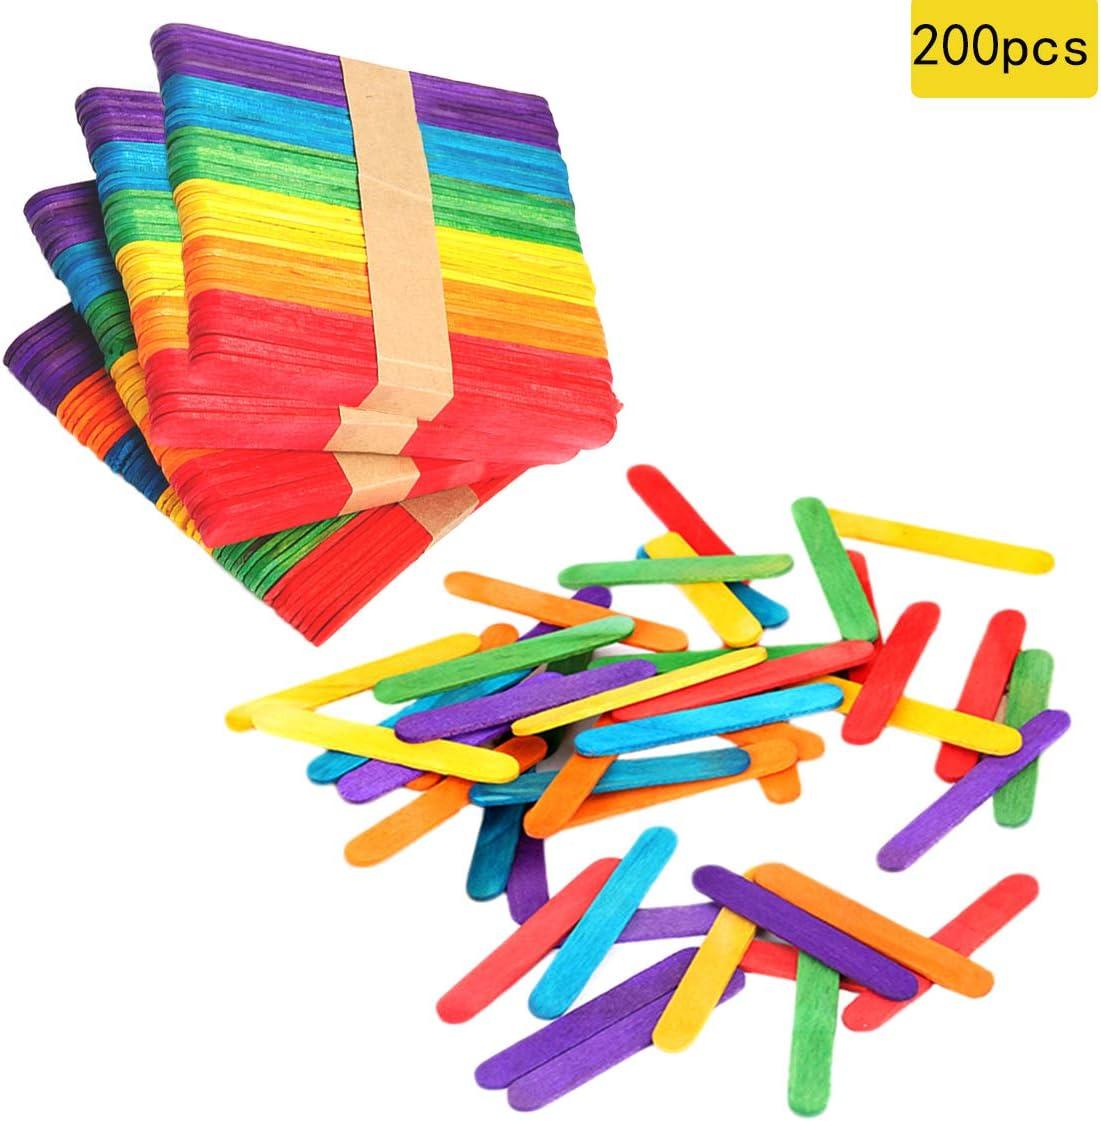 "200 PCS Colorful Craft Sticks Natural Wooden 4-1/2"" Length Treat Sticks Great for DIY Craft Creative Designs"